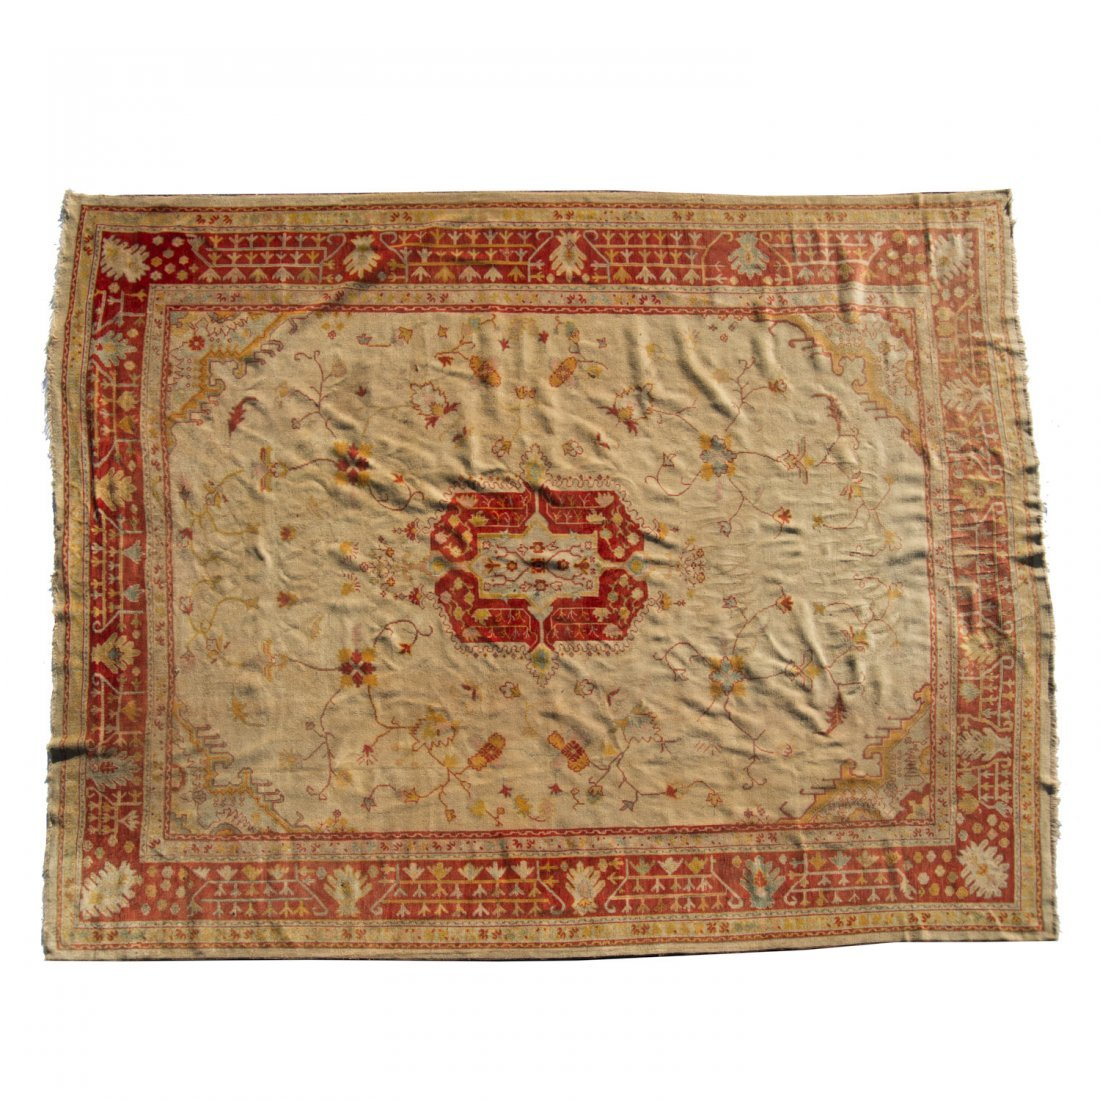 Room-size Oushak carpet